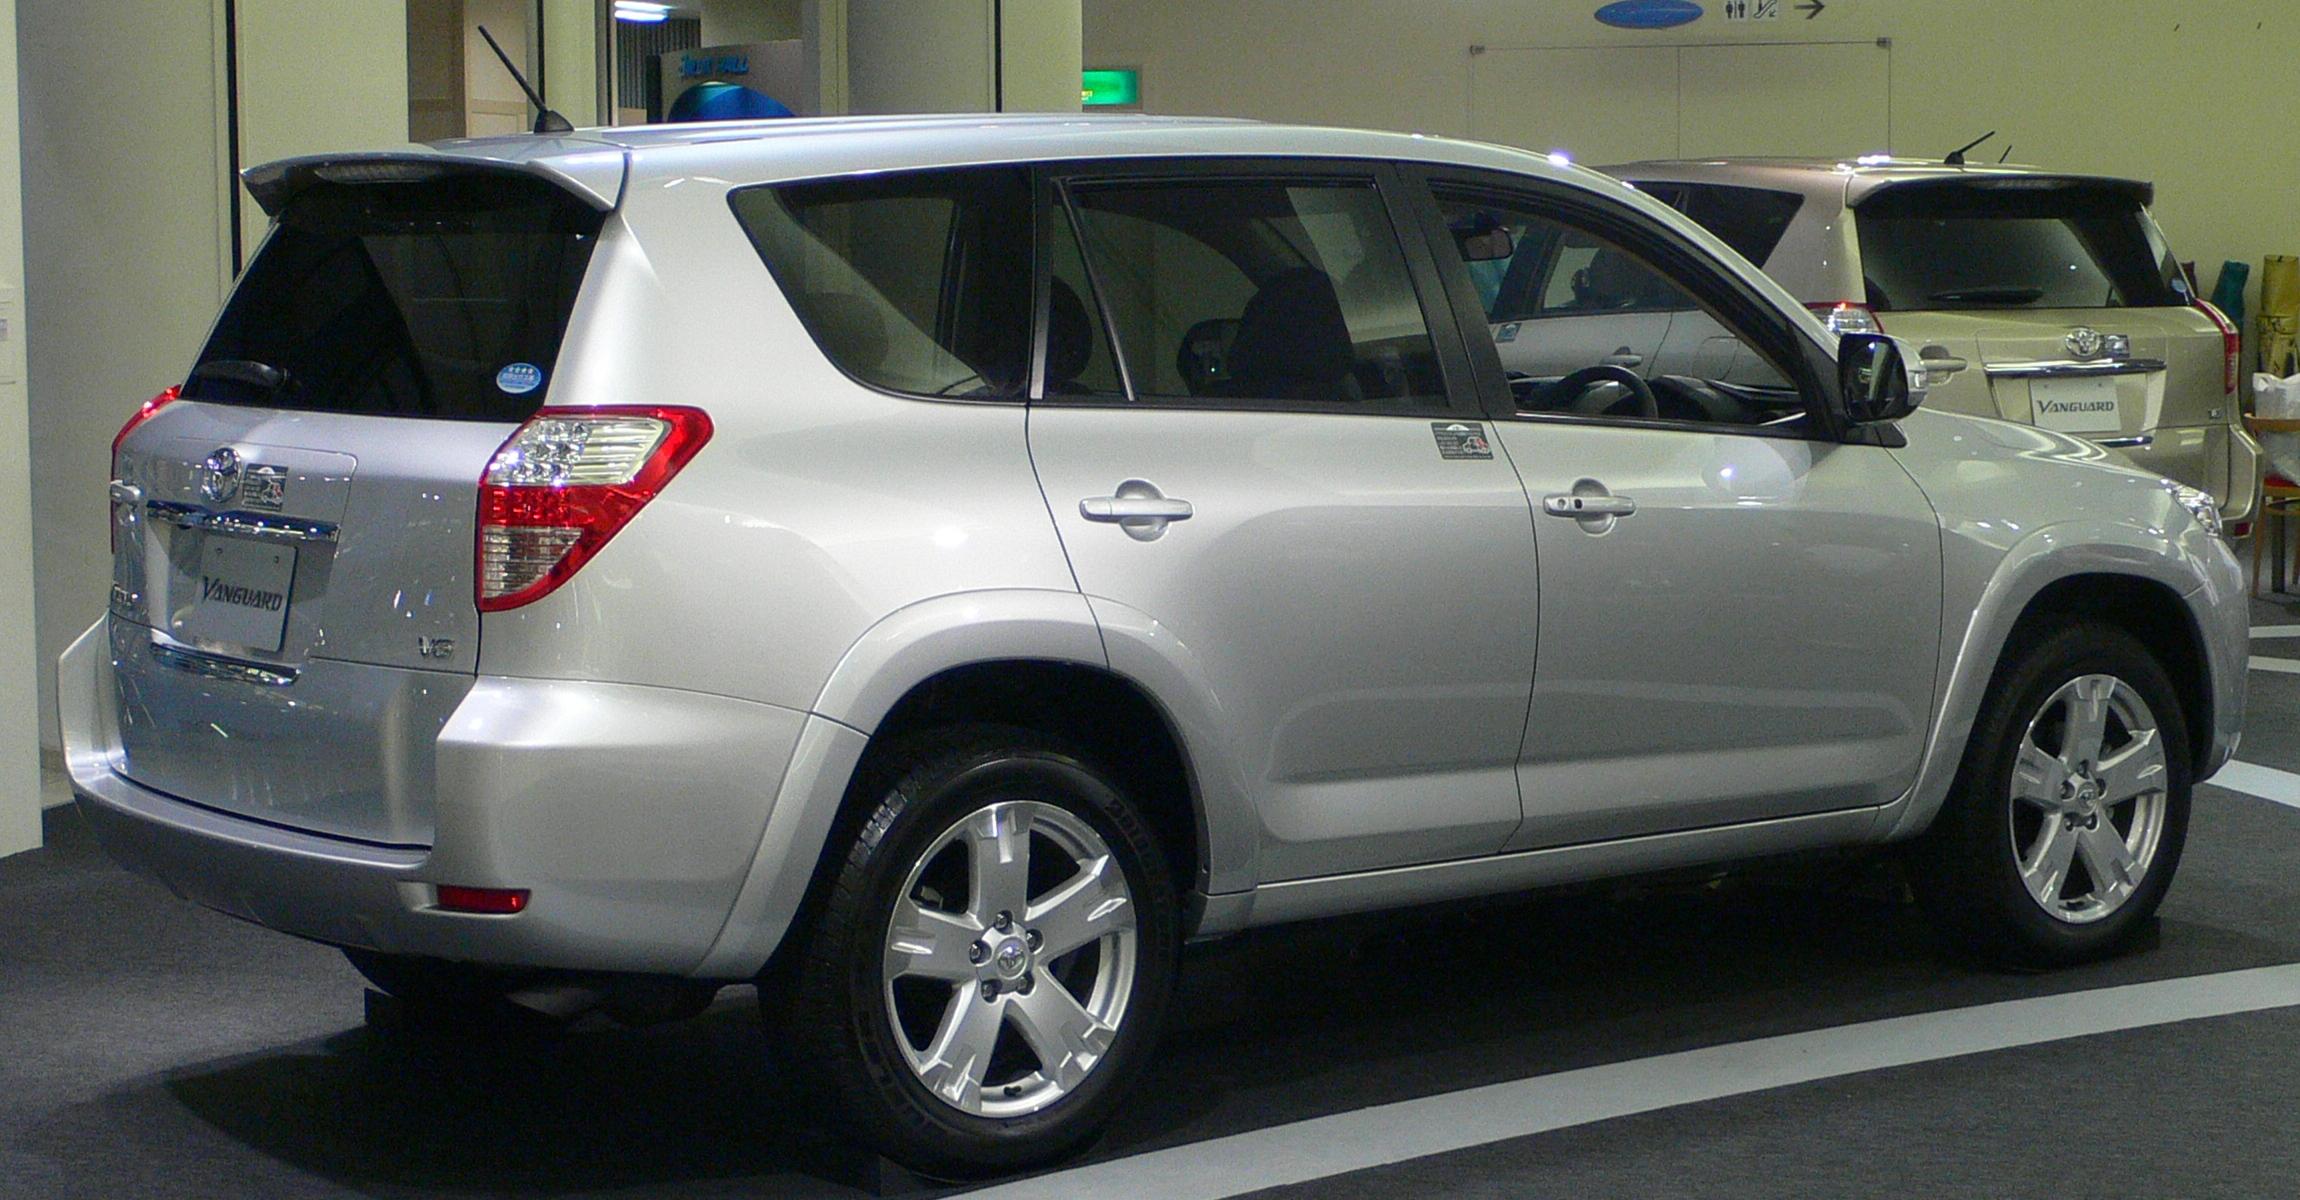 File:2007 Toyota Vanguard 02.jpg - Wikimedia Commons